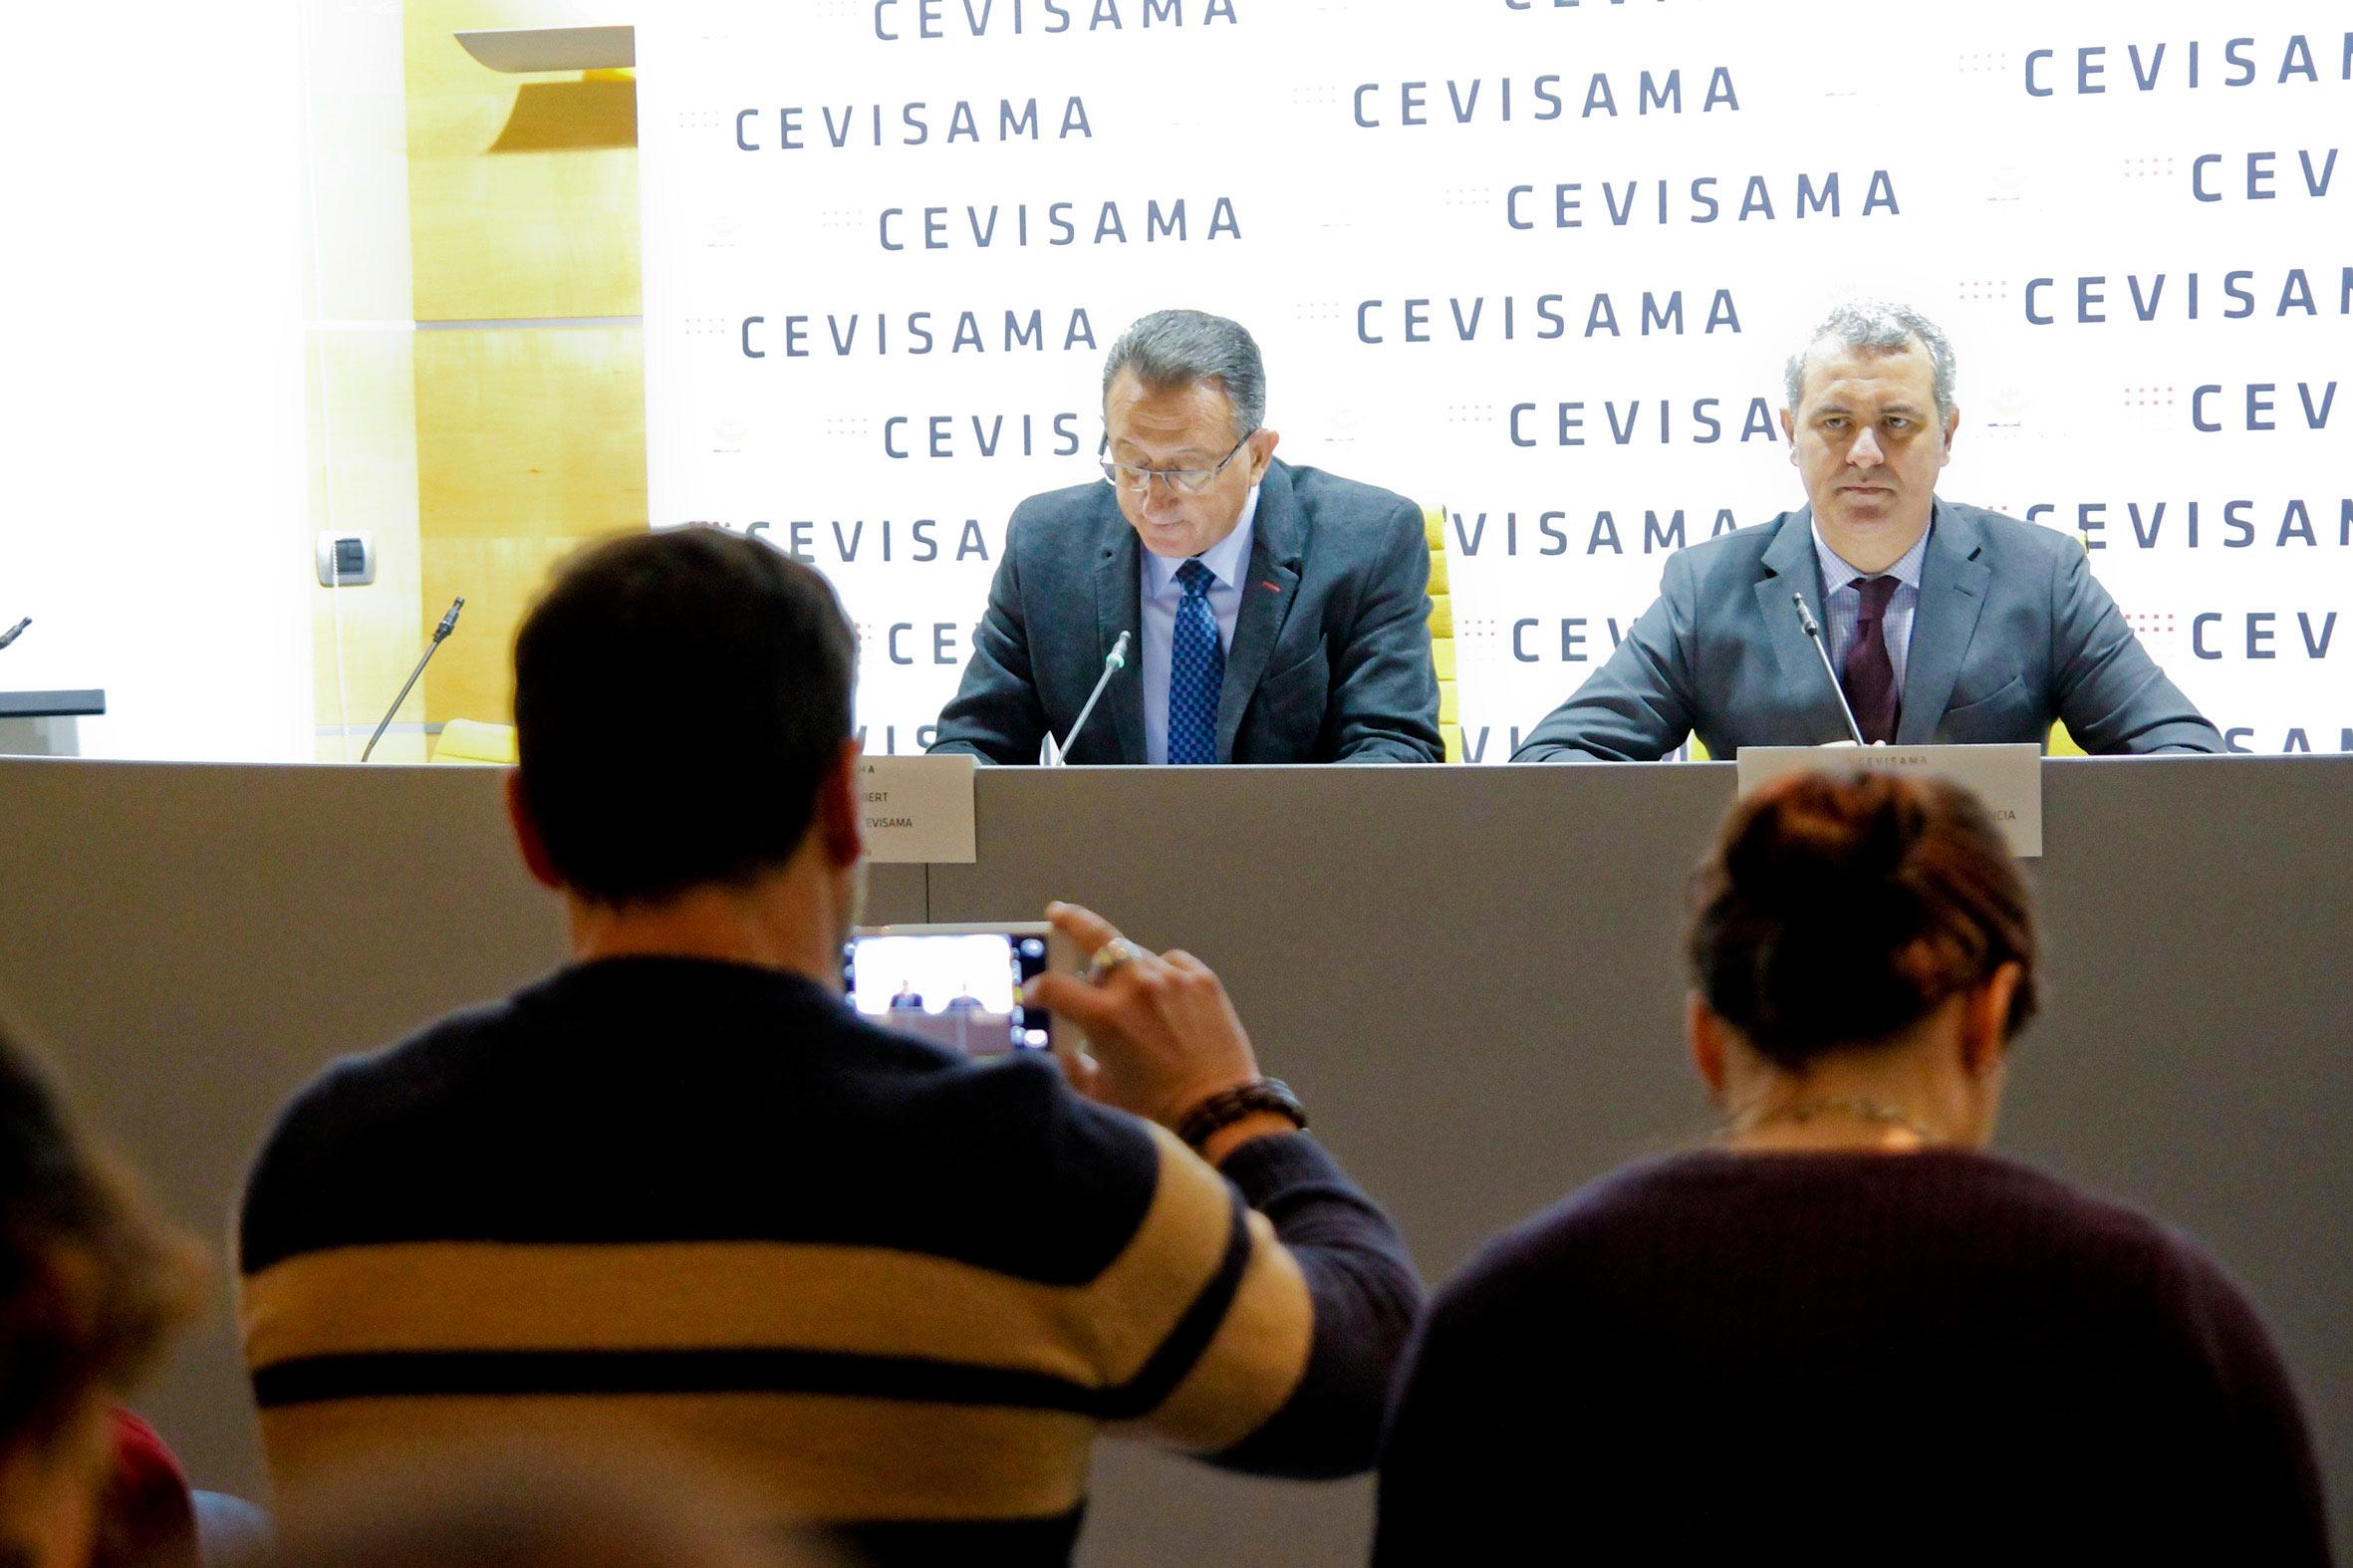 presentación Cevisama17